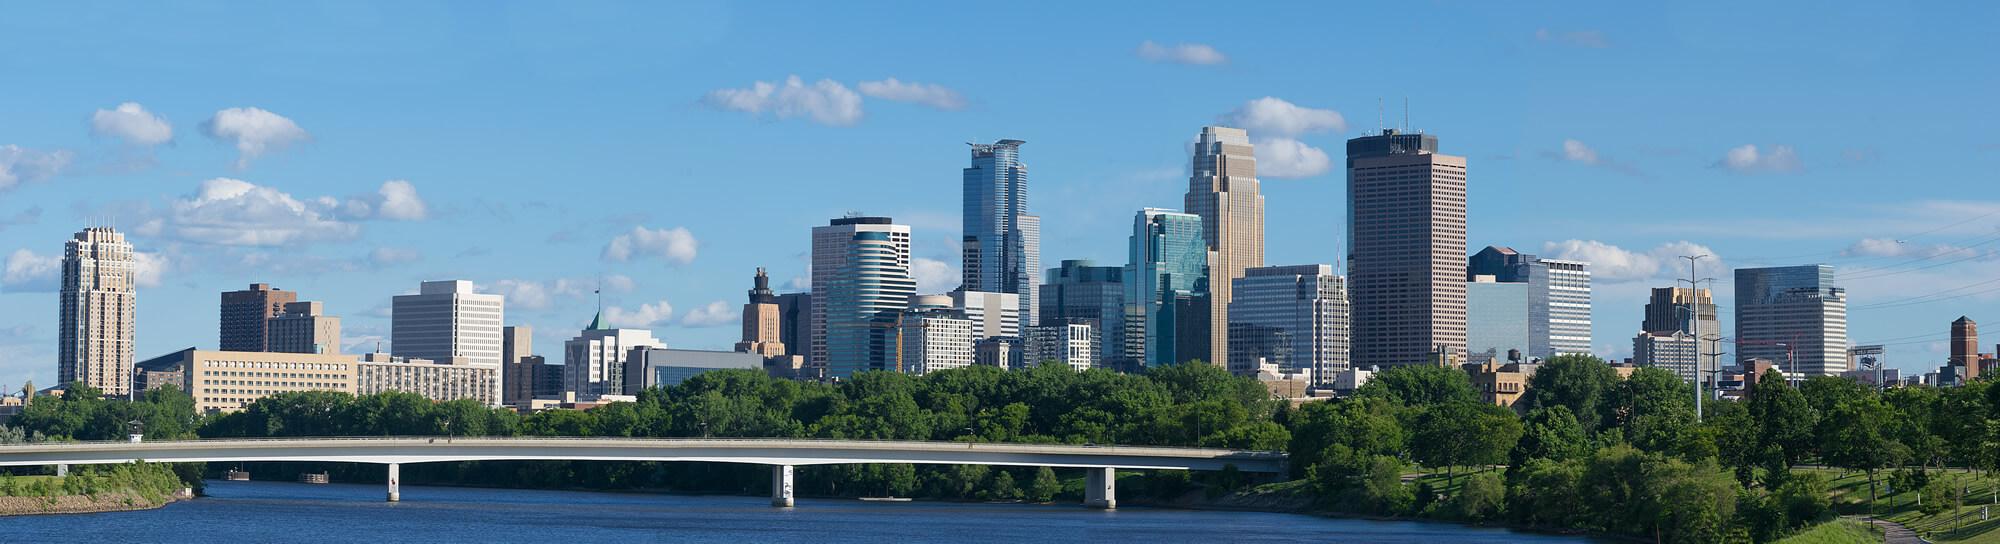 Mississippi River Minneapolis Skylines